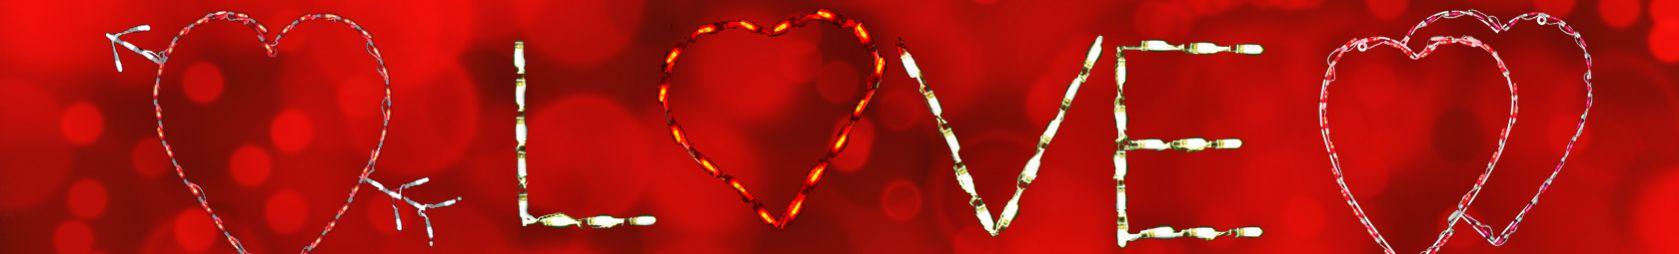 LED Valentine's Day Displays